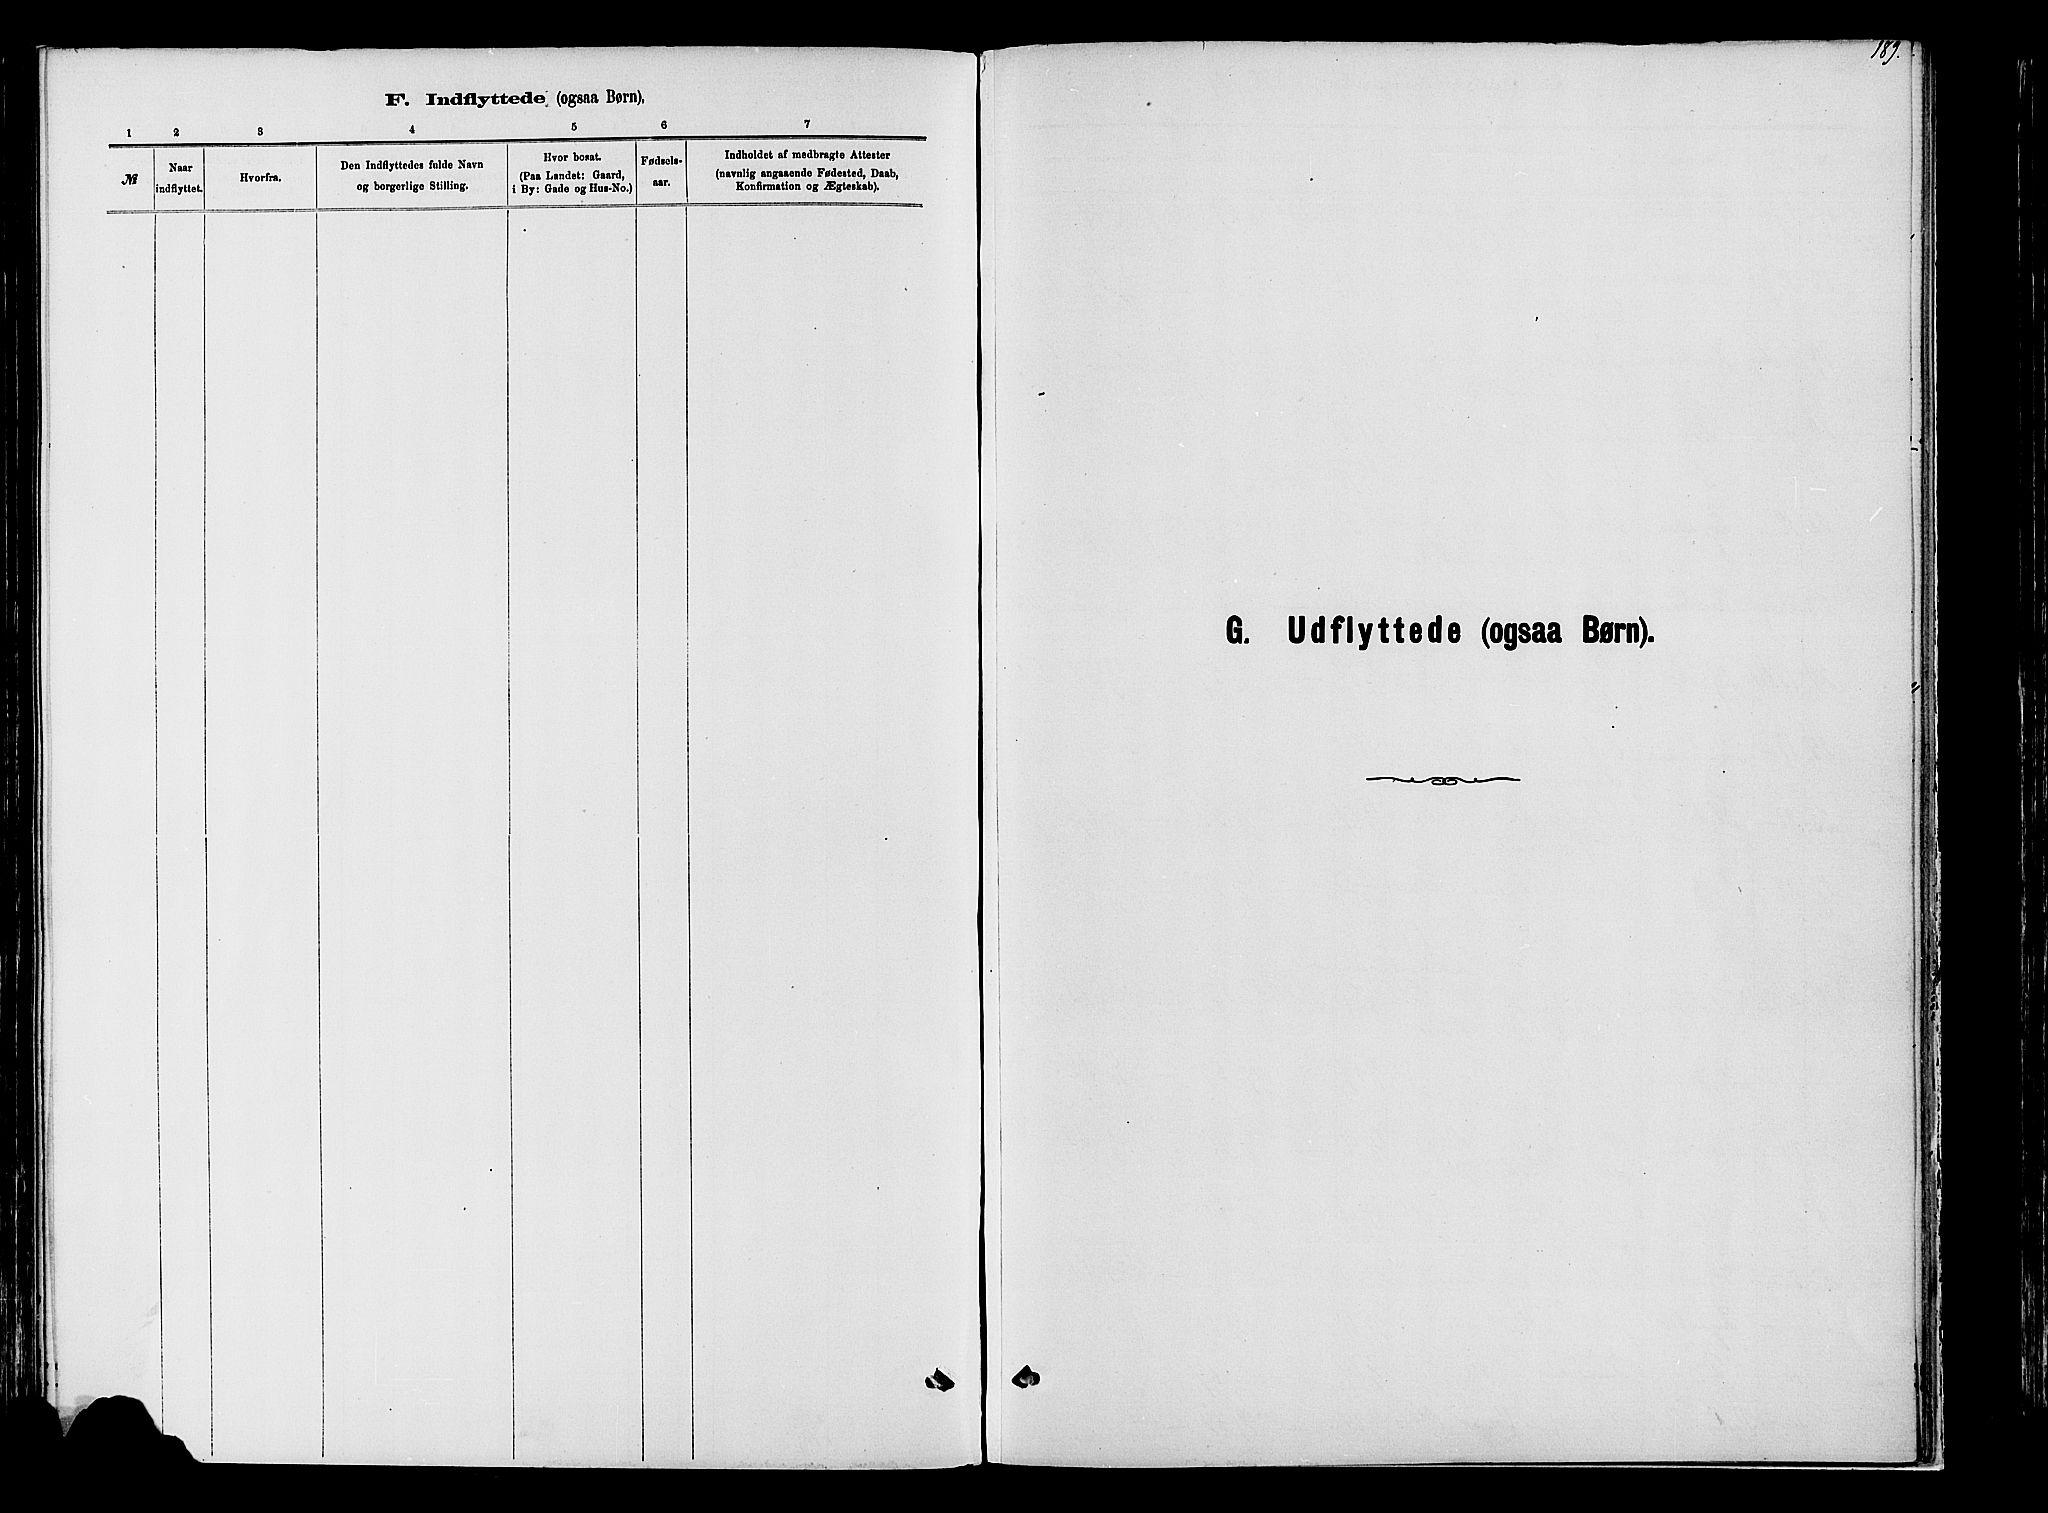 SAH, Vardal prestekontor, H/Ha/Haa/L0009: Ministerialbok nr. 9, 1878-1892, s. 189